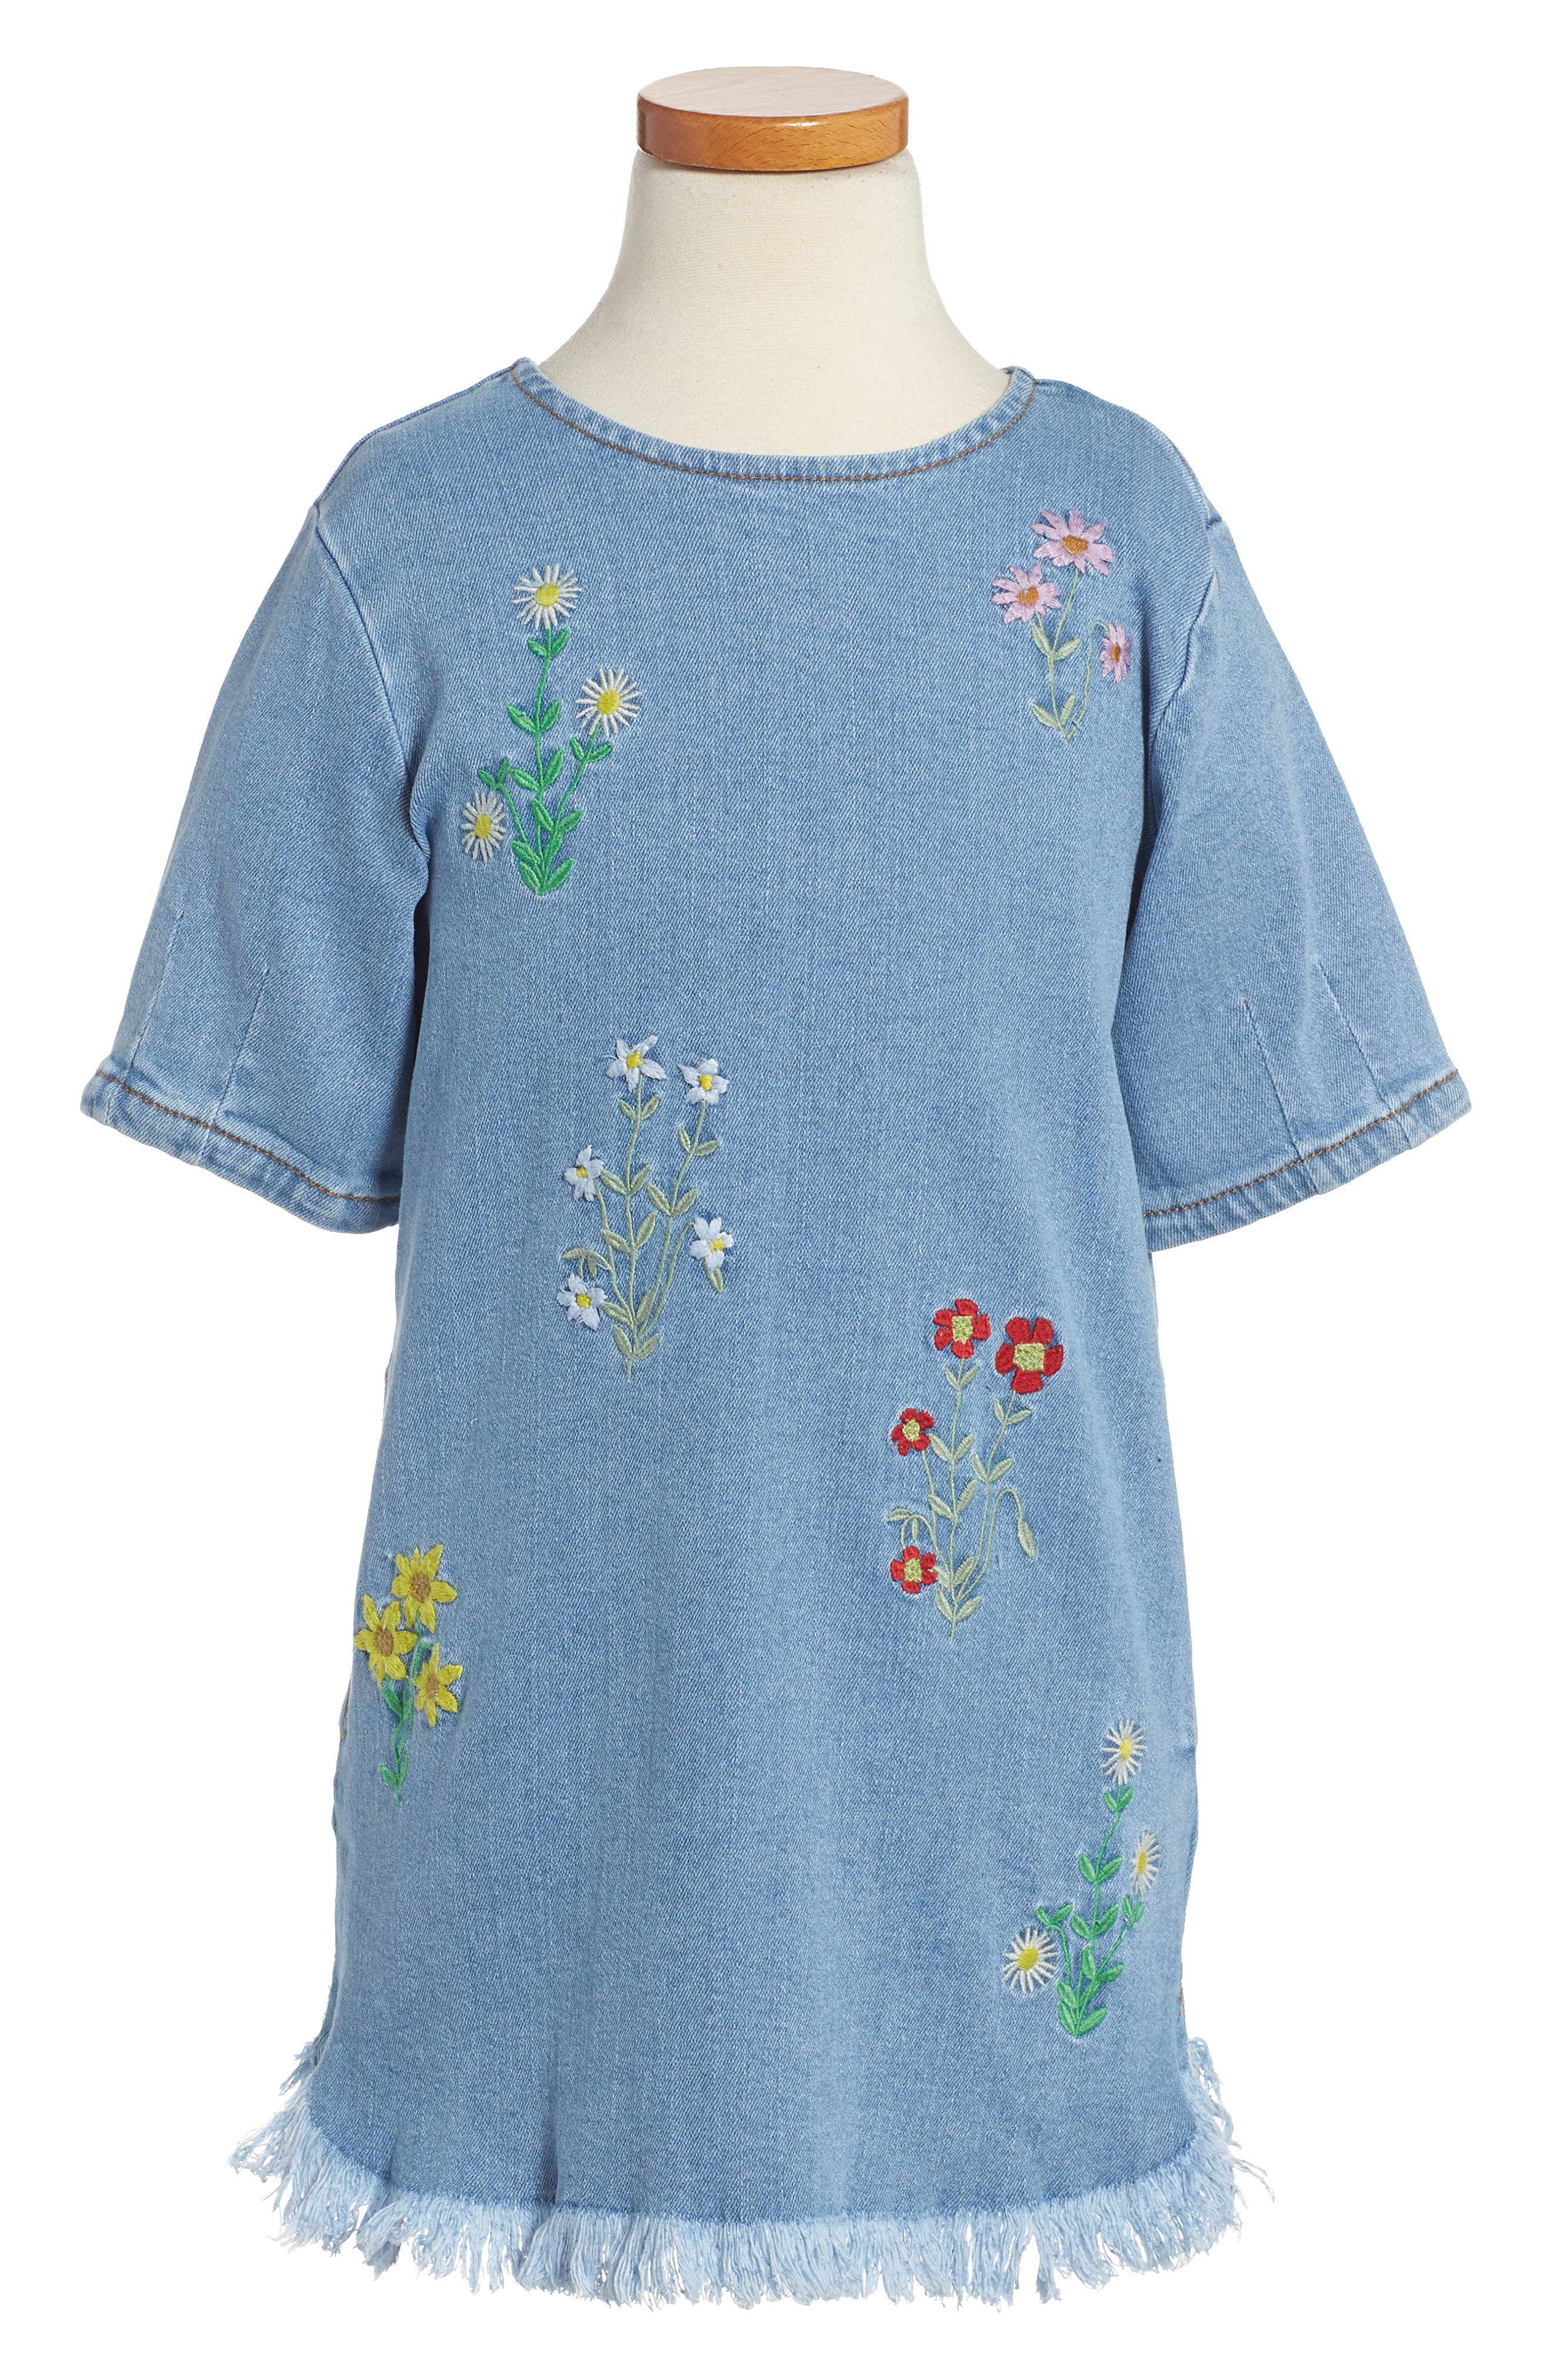 Stella McCartney Bess Embroidered Chambray Dress (Toddler Girls, Little Girls & Big Girls)